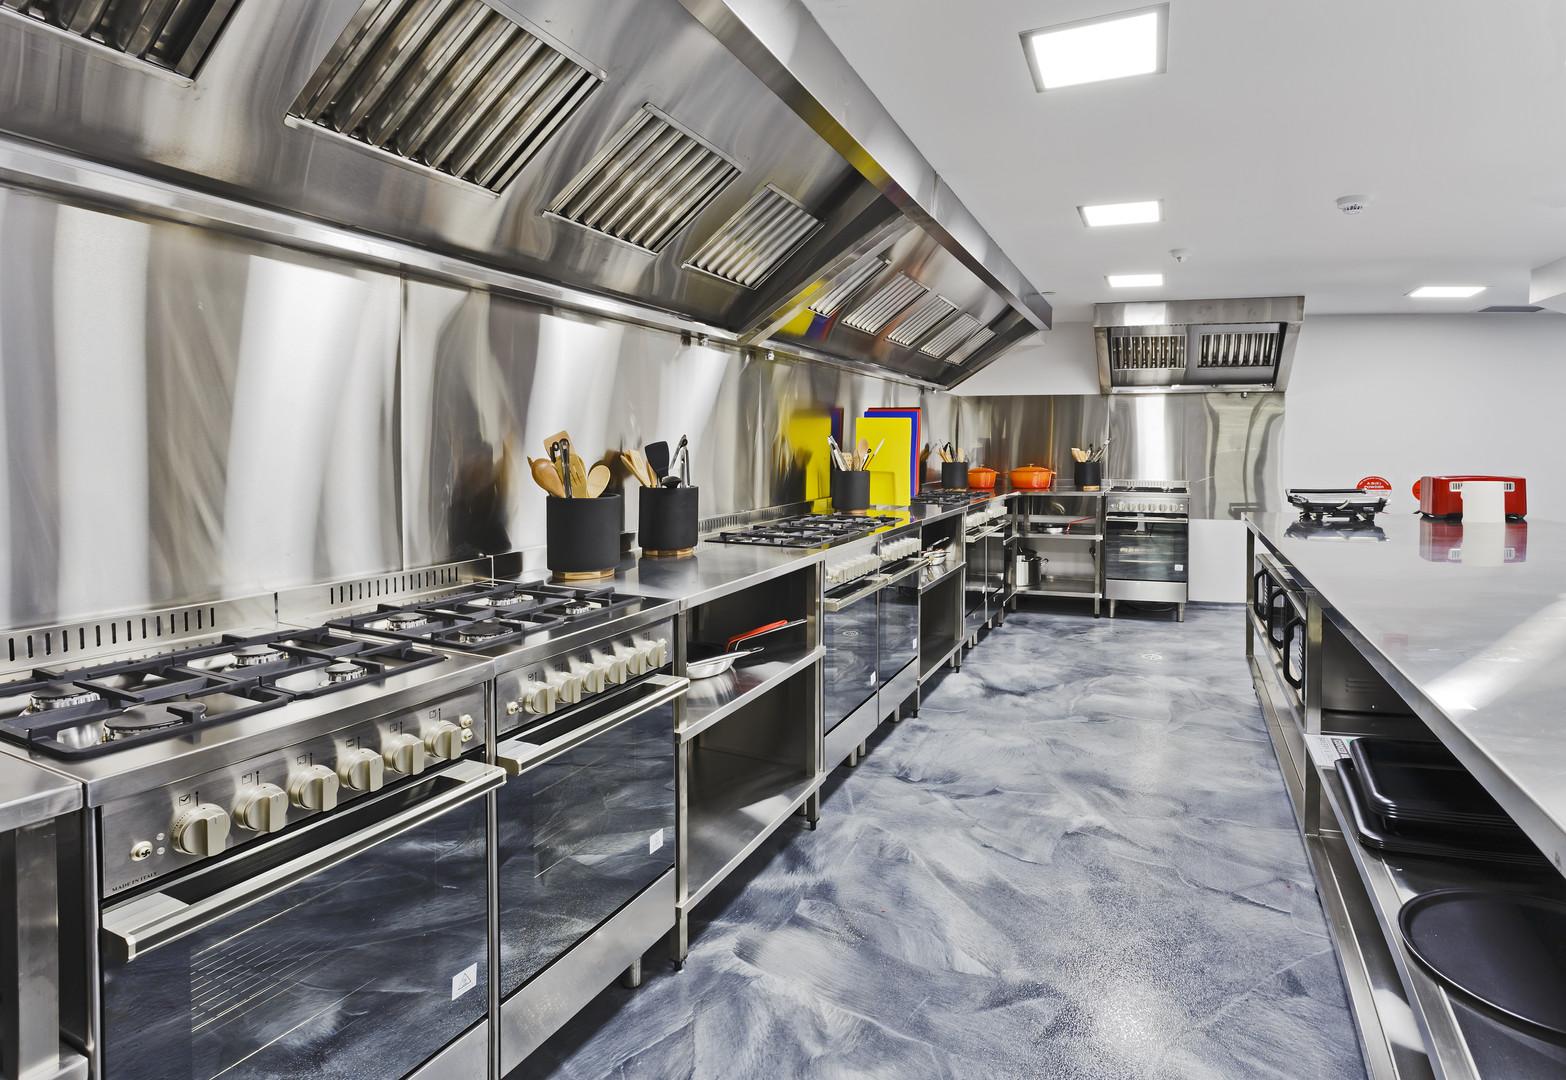 Modern shiny kitchen with stainless stil